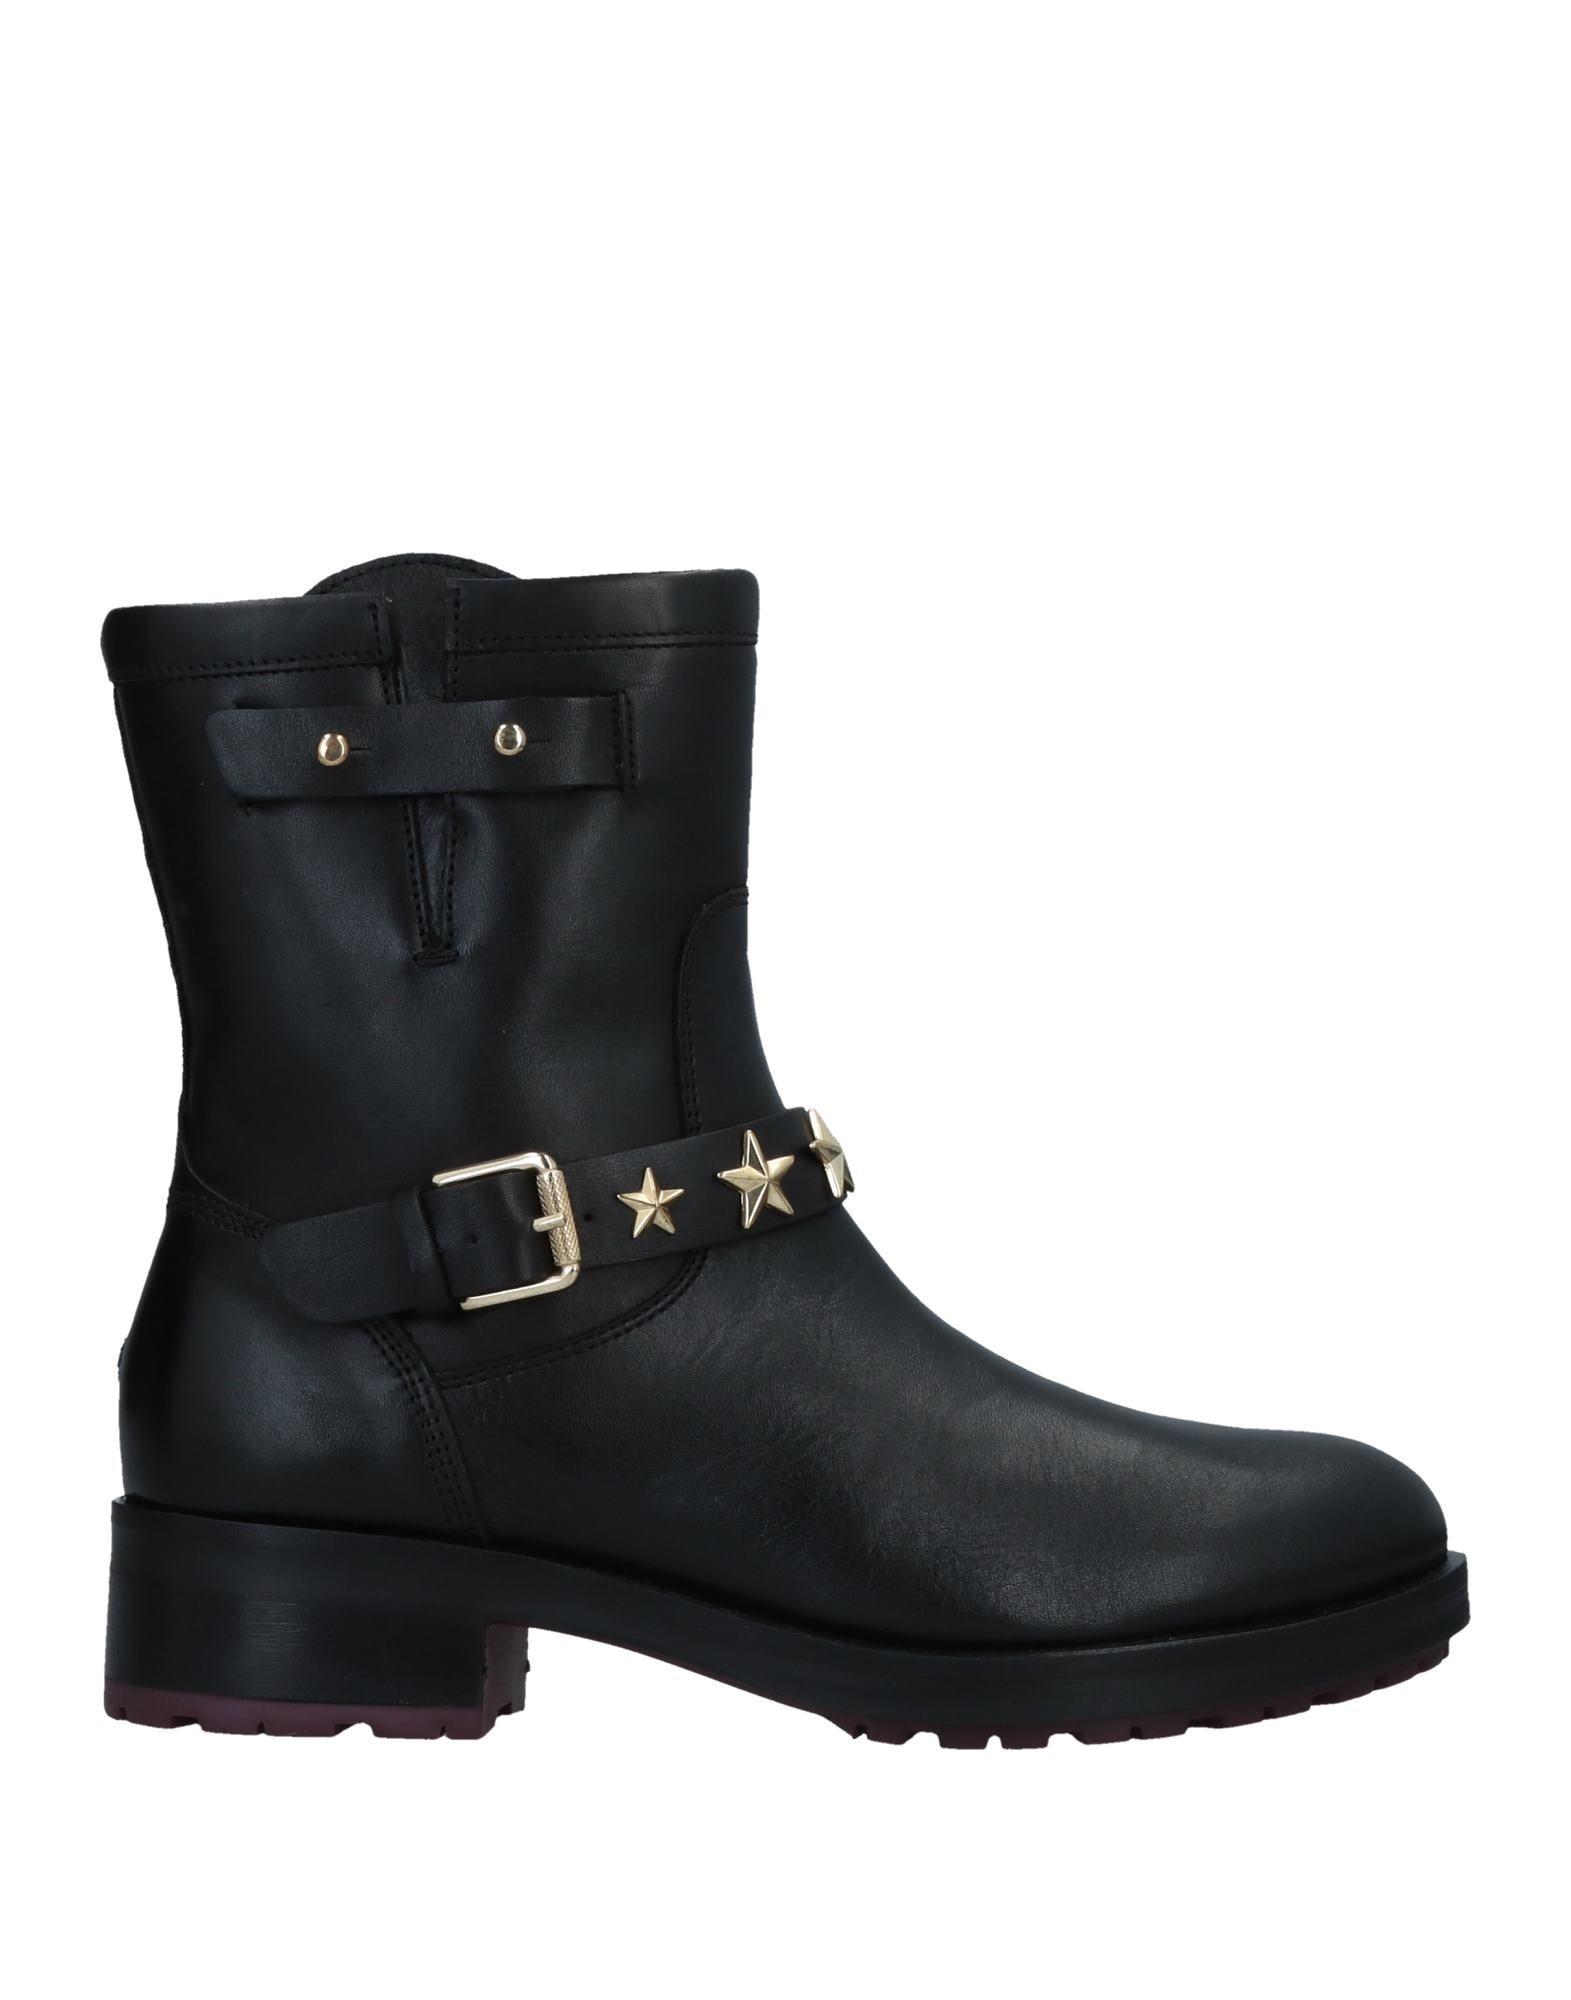 Stilvolle billige Schuhe Tommy 11508374LF Hilfiger Stiefelette Damen  11508374LF Tommy e23695